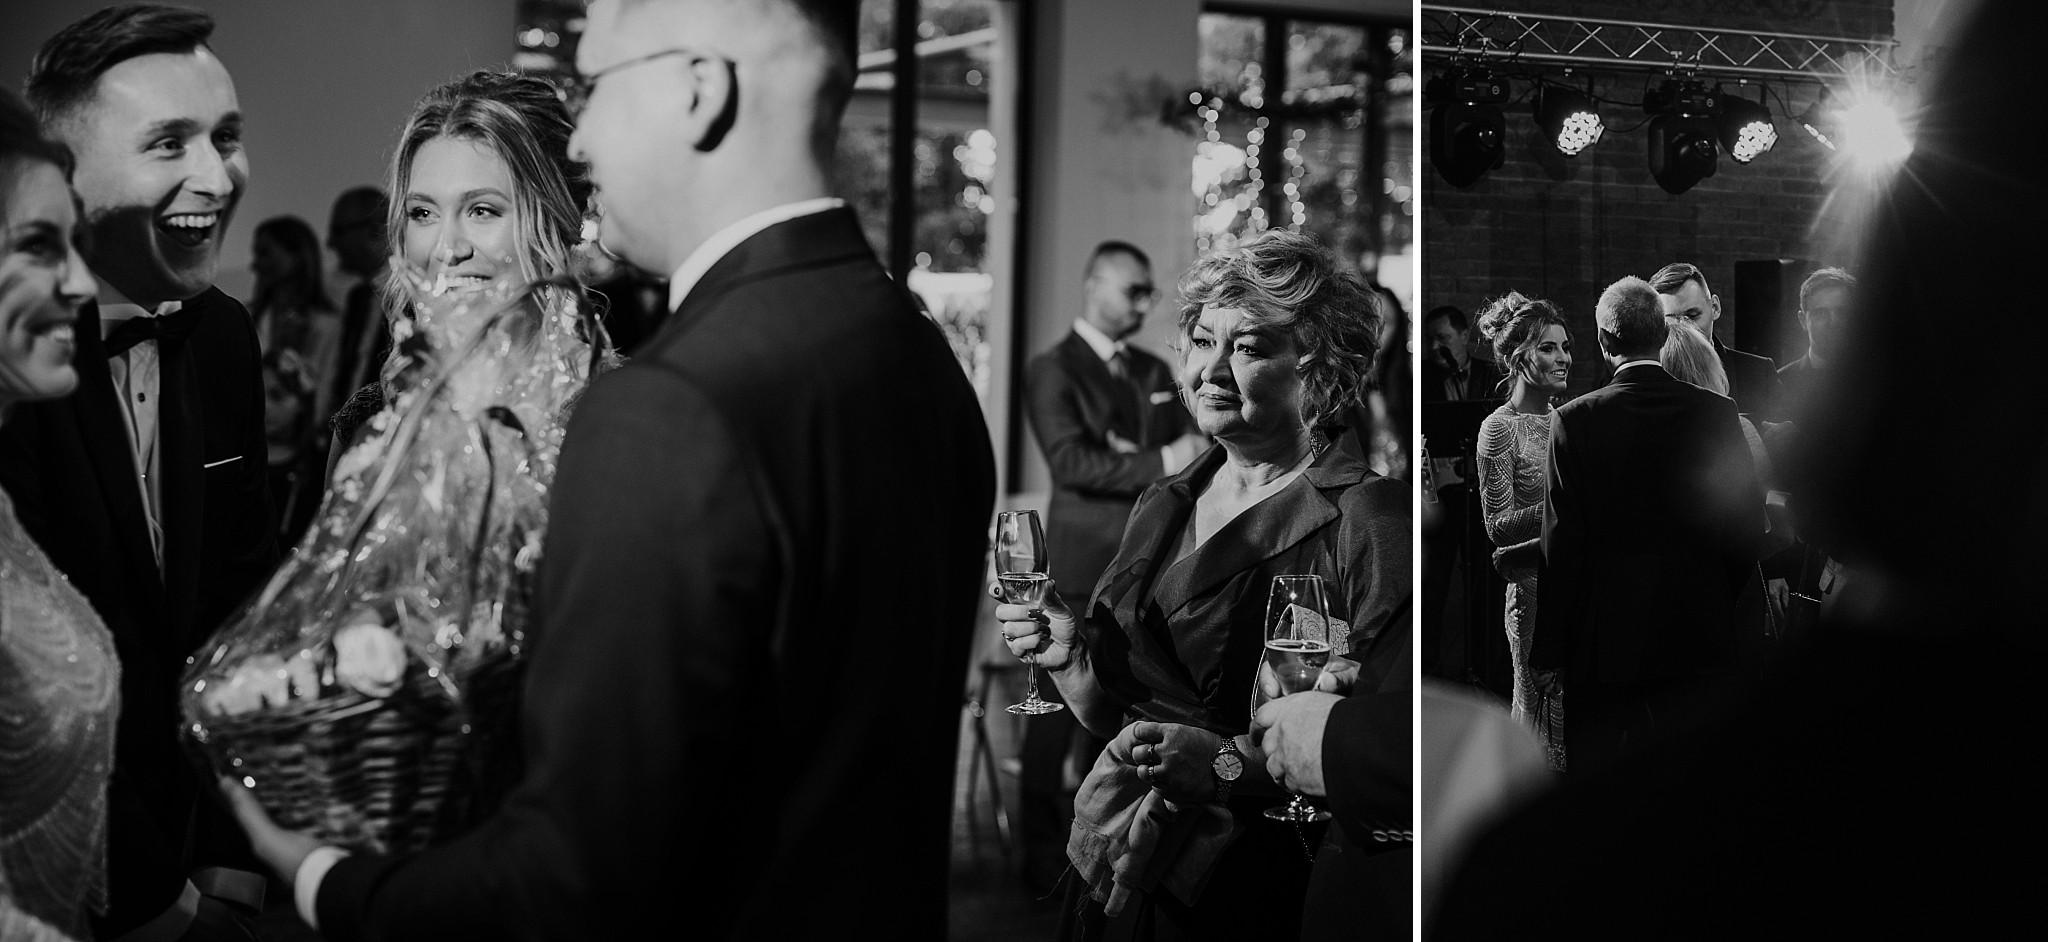 fotograf poznan wesele dobra truskawka piekne wesele pod poznaniem wesele w dobrej truskawce piekna para mloda slub marzen slub koronawirus slub listopad wesele koronawirus 283